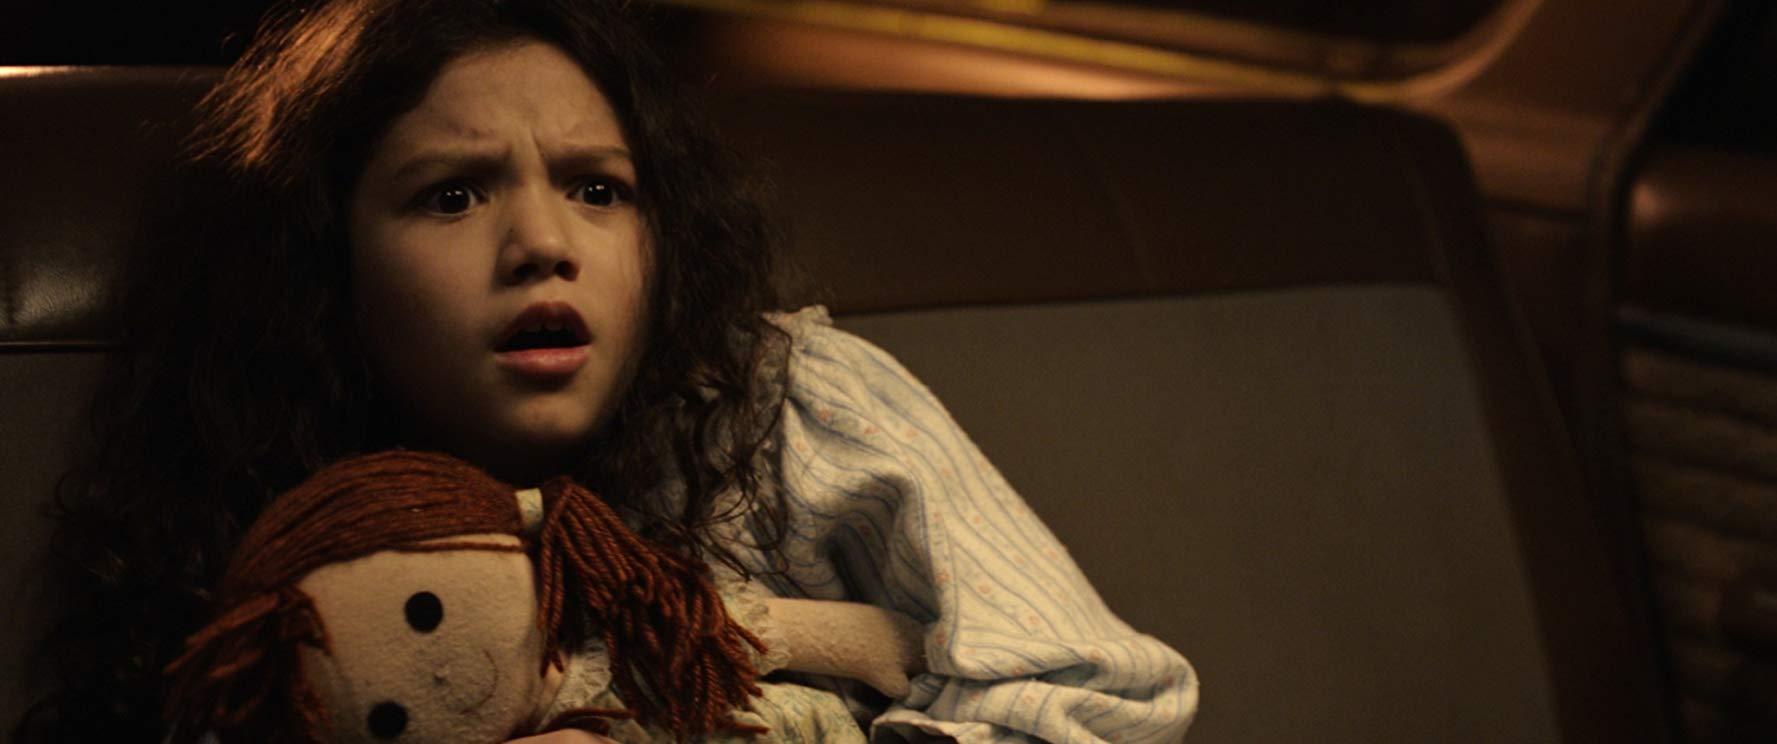 La Llorona - le lacrime del male: una scena con Jaynee-Lynne Kinchen